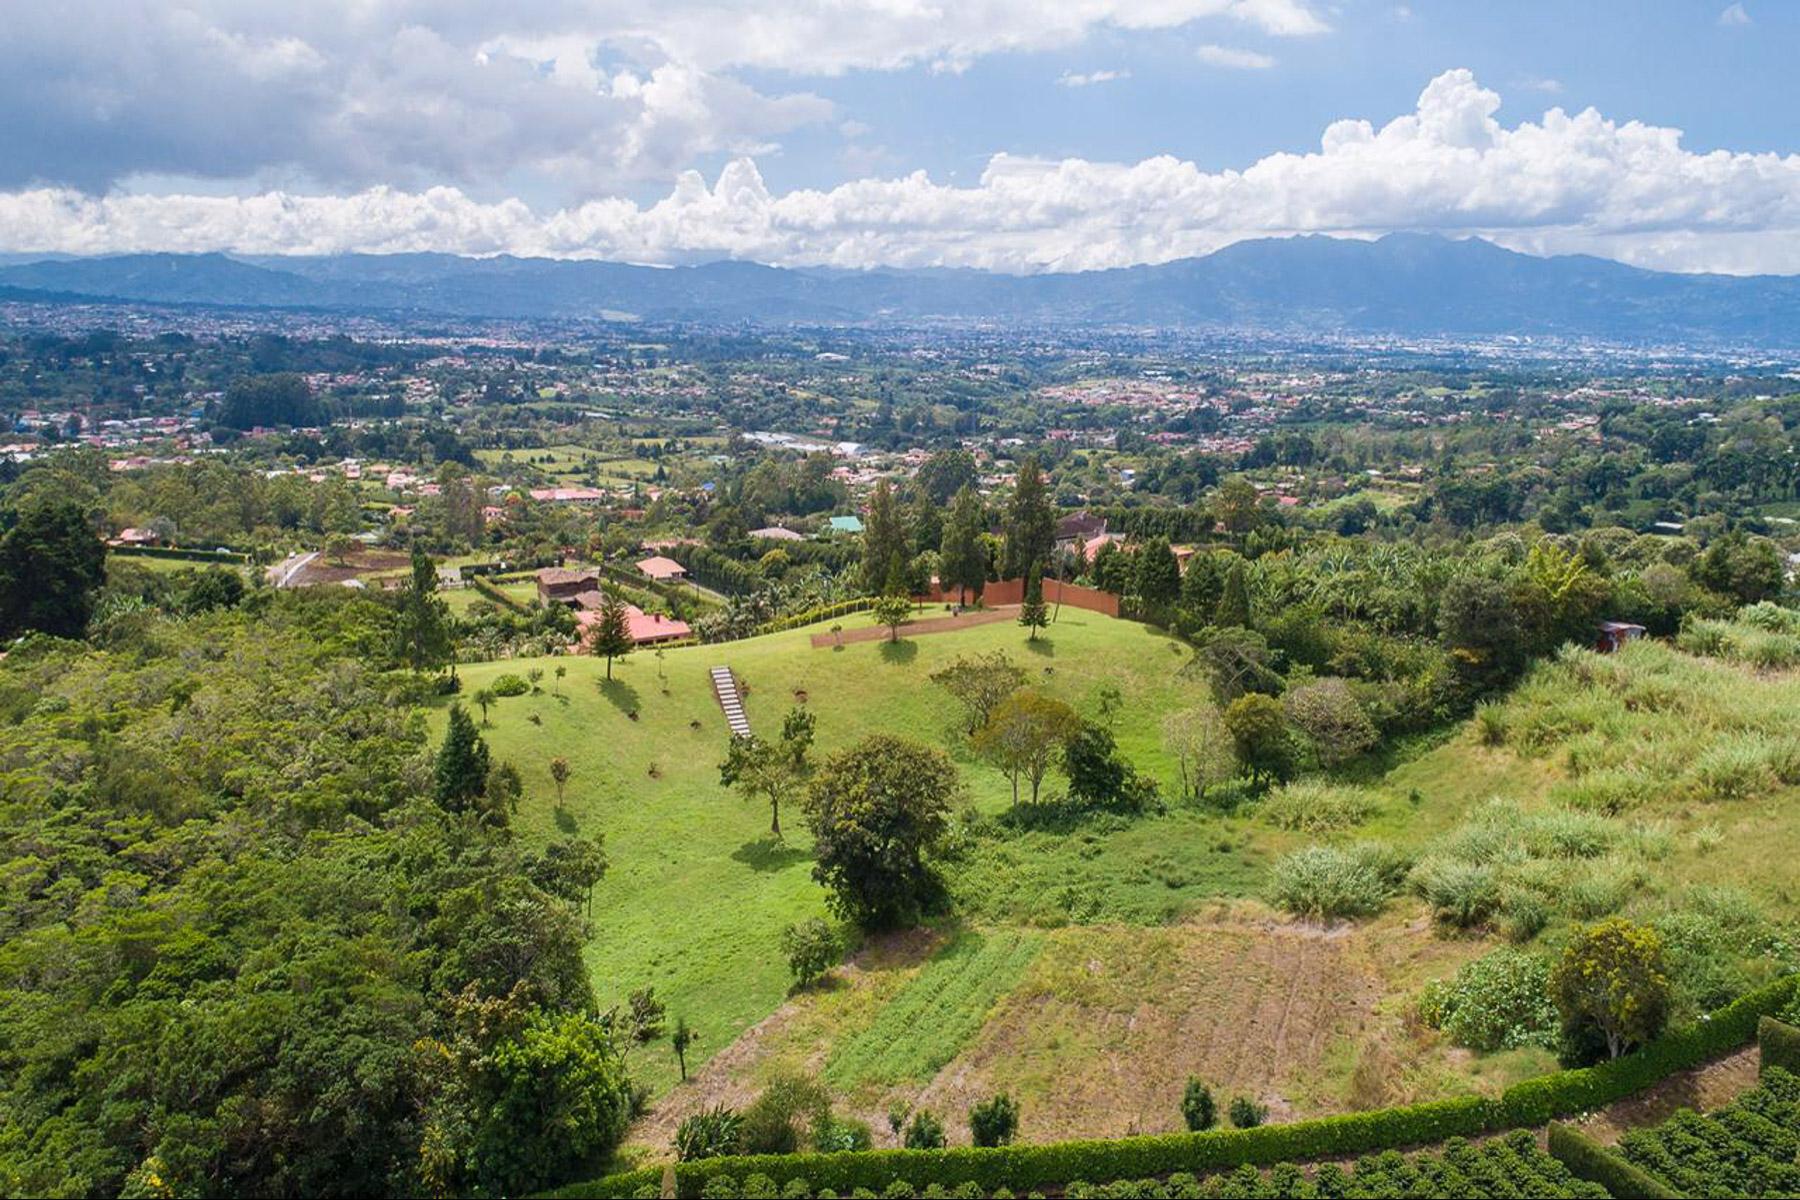 Land for Sale at Los Altos de San Isidro San Isidro, Heredia Costa Rica